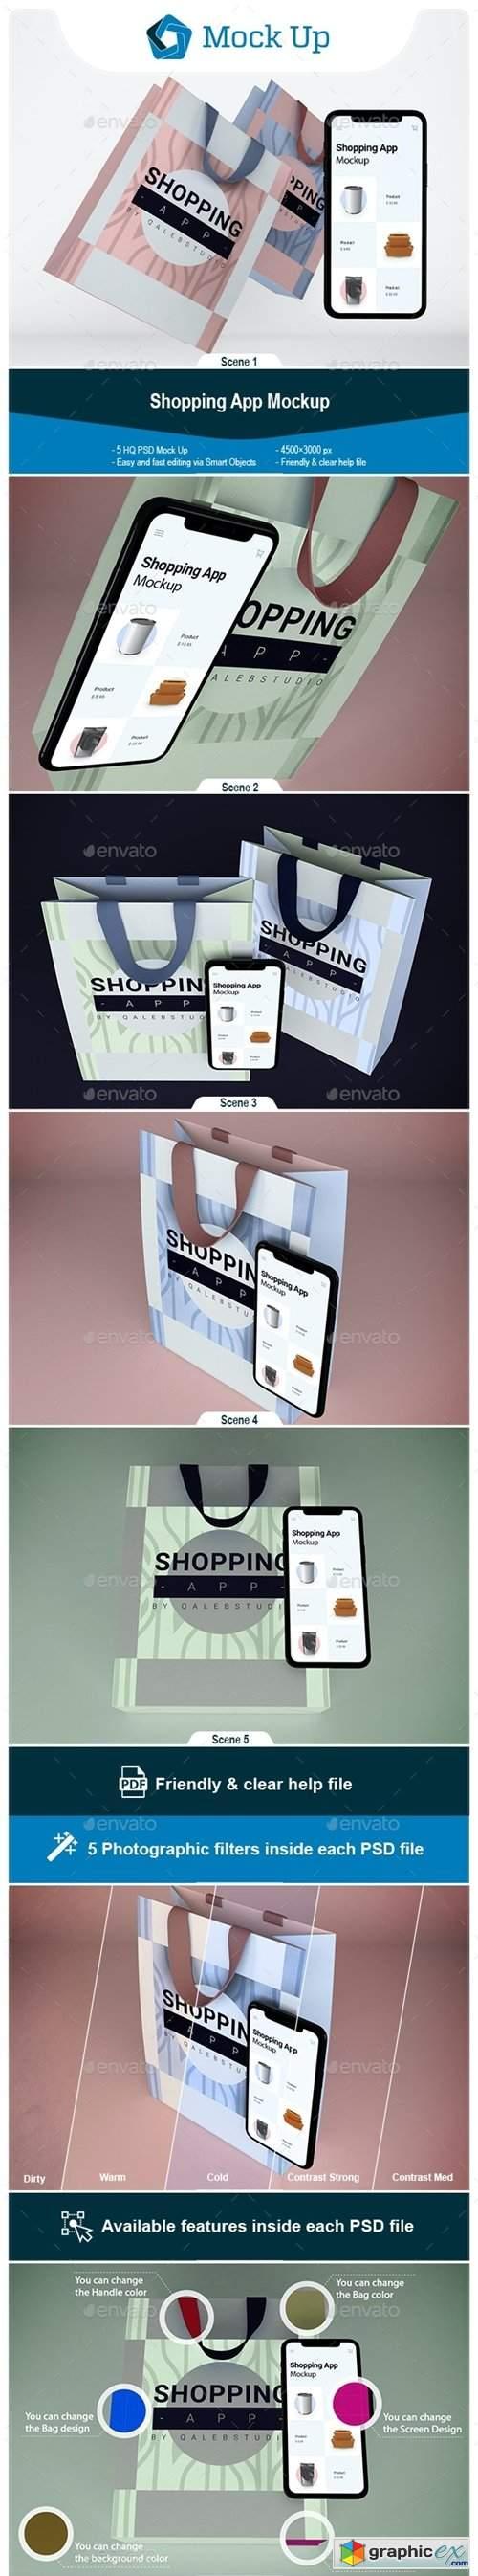 Shopping App Mockup